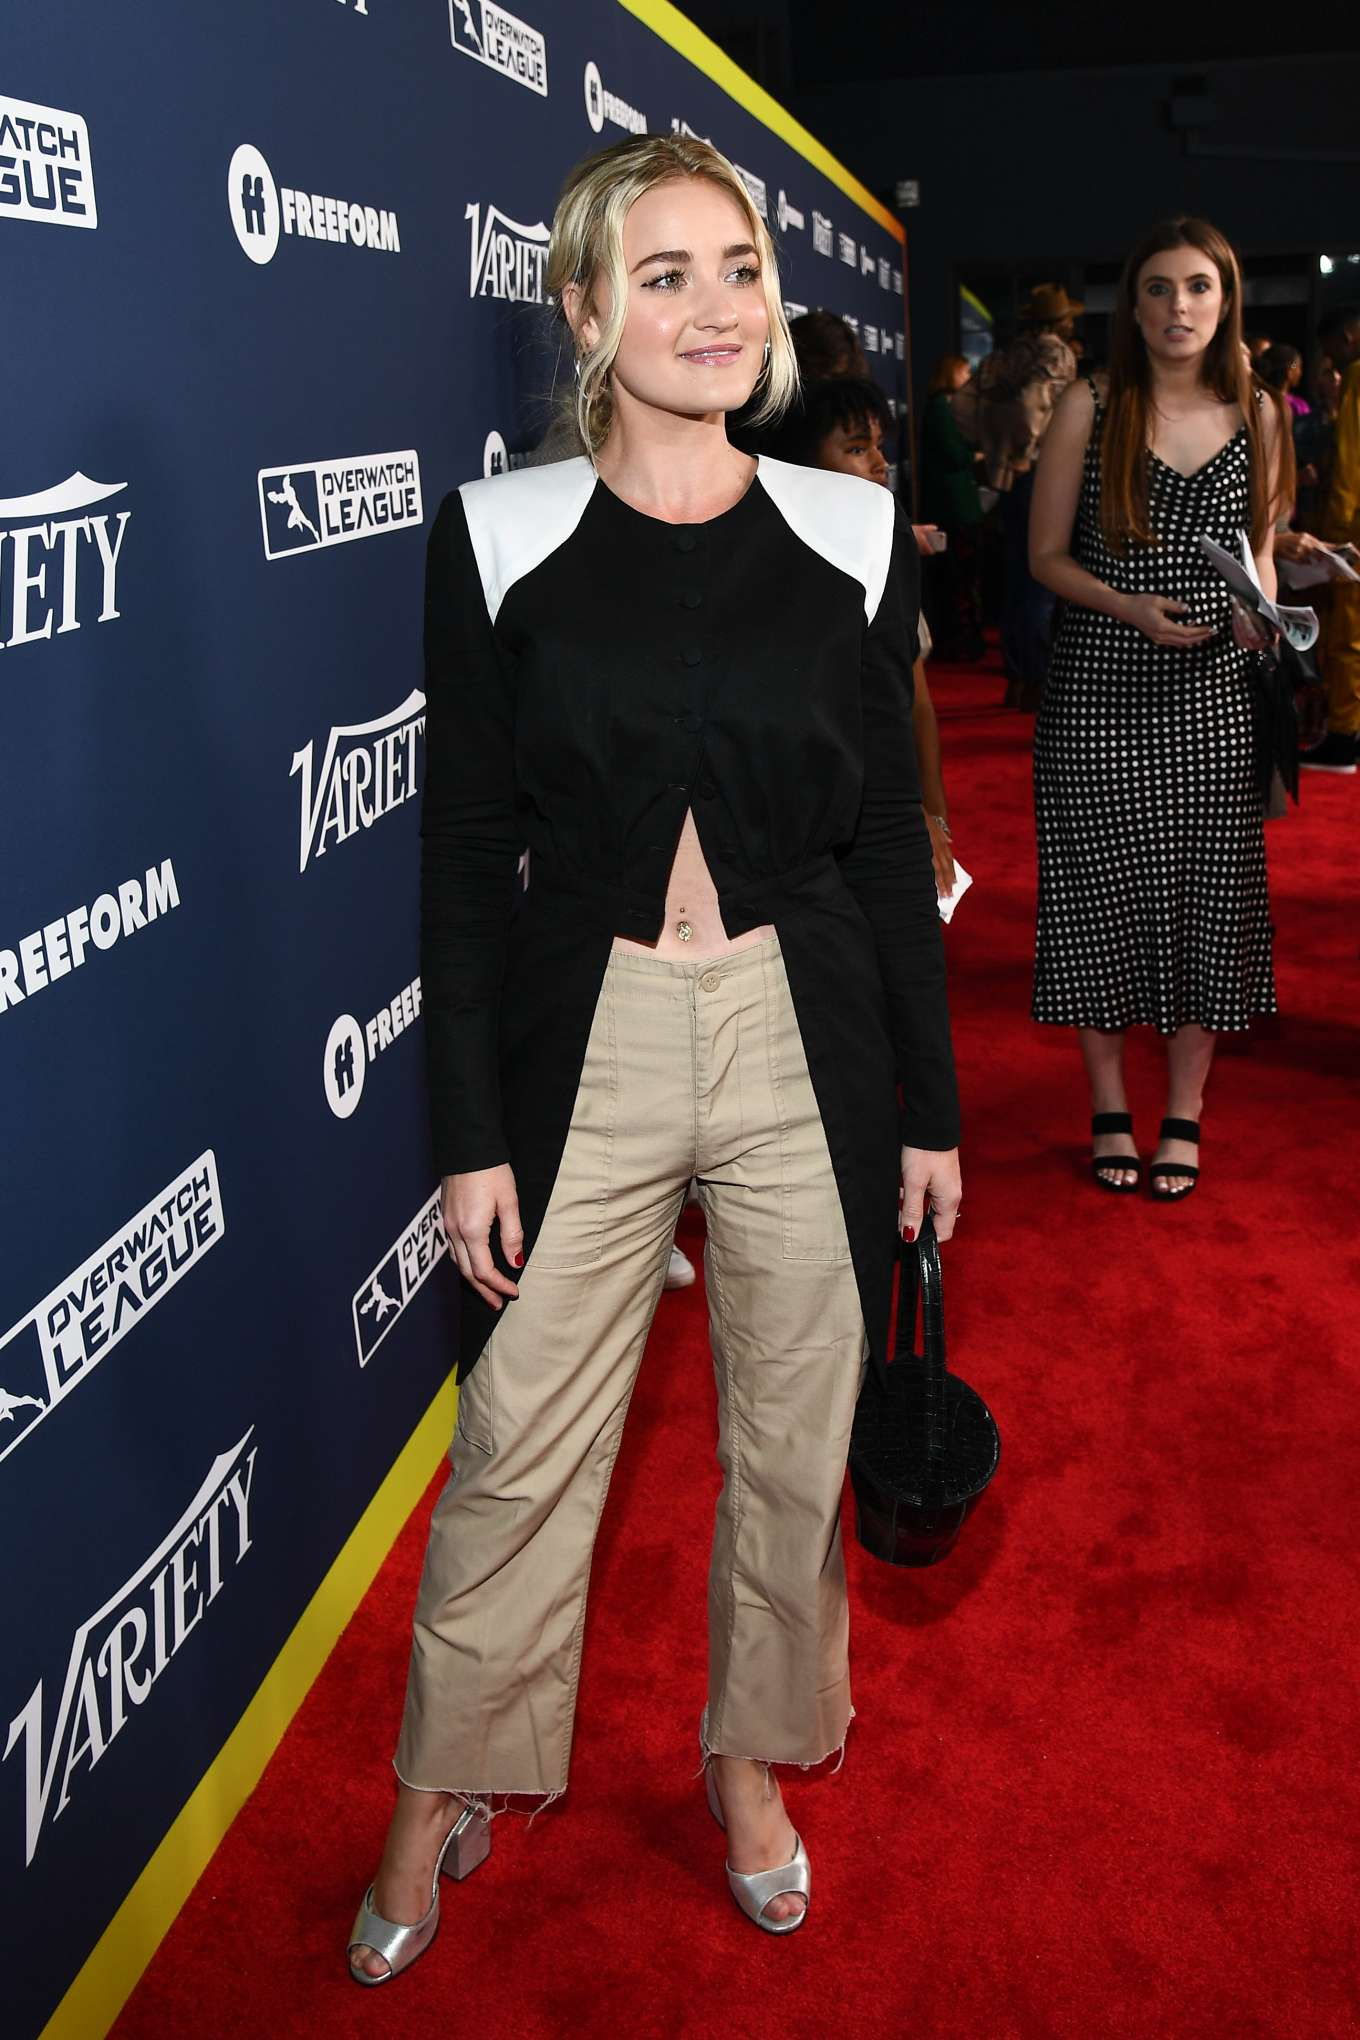 AJ Michalka 2019 : AJ Michalka – Varietys Power of Young Hollywood 2019-22